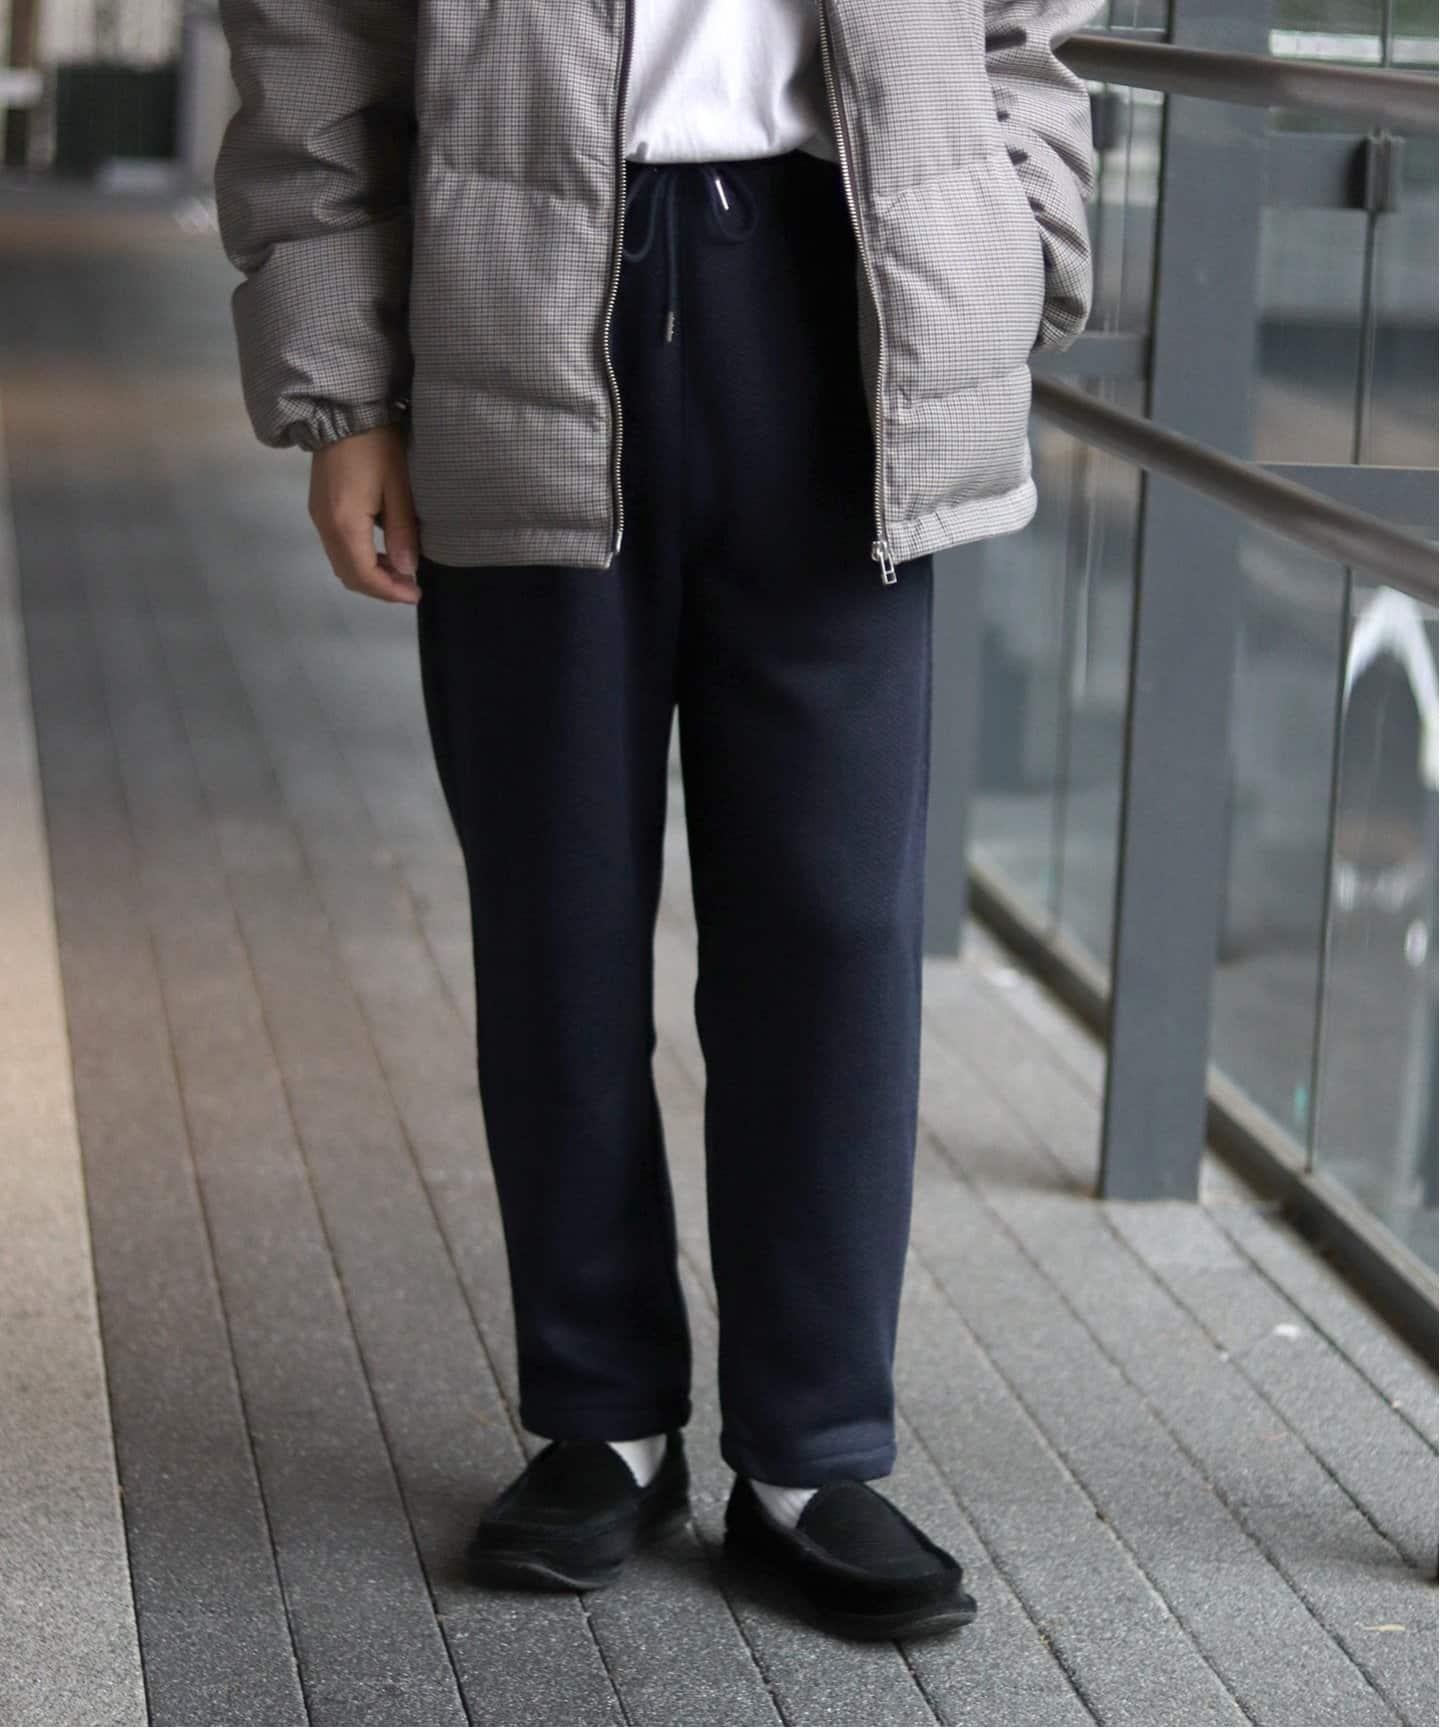 B.C STOCKのパンツ・ズボン/パンツ・ズボン全般 ネイビー